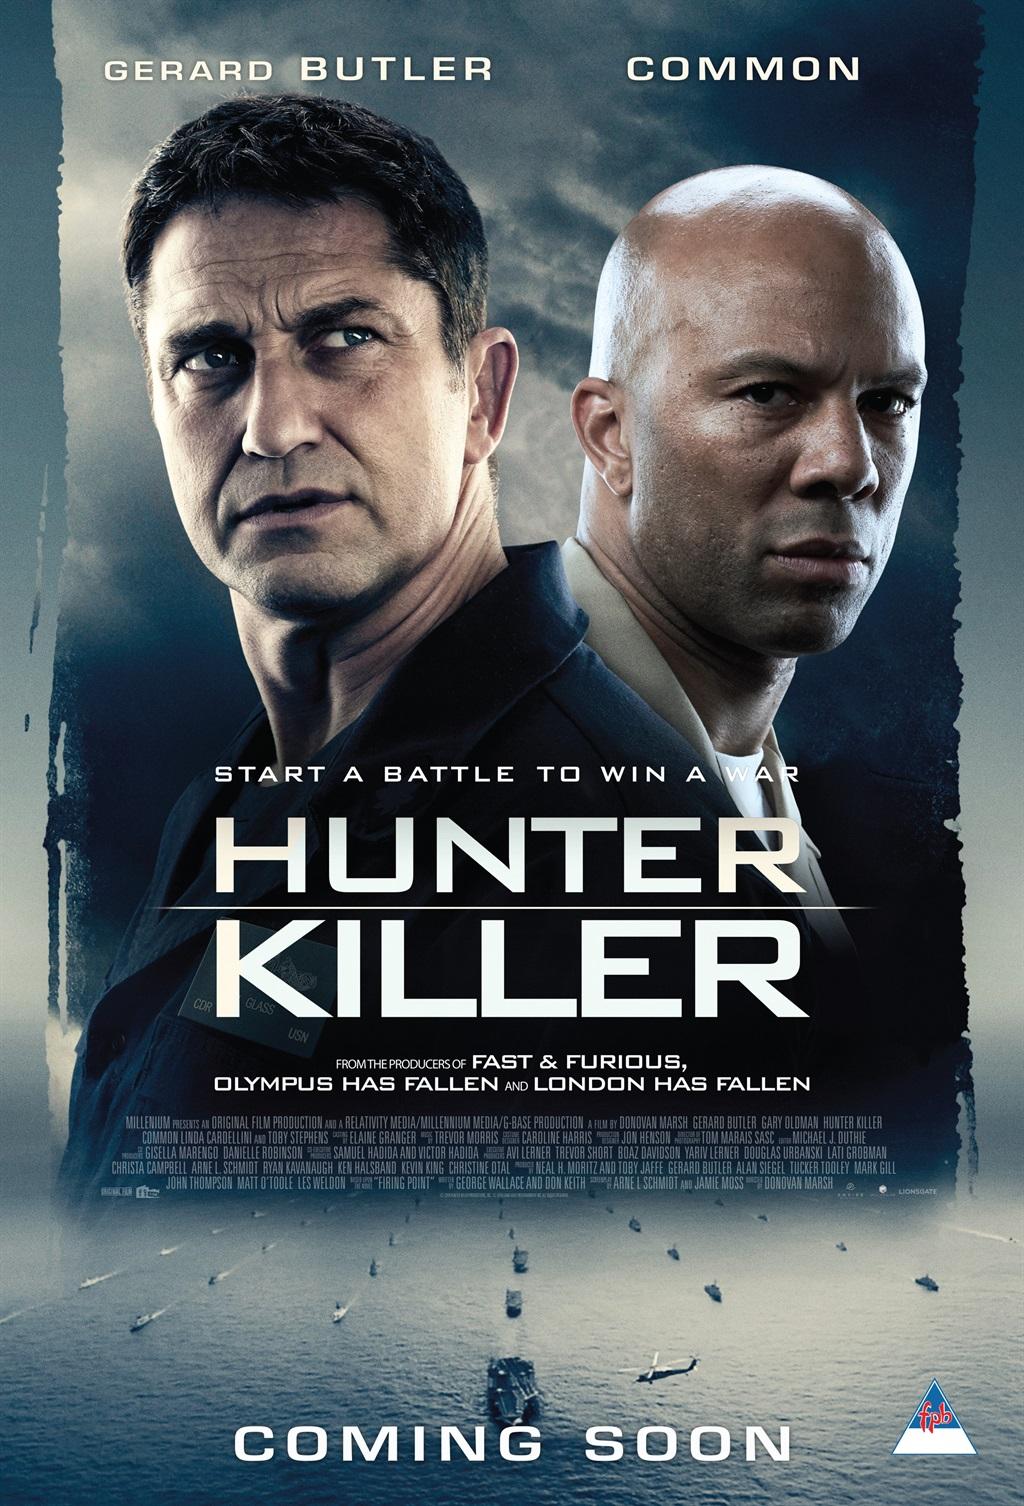 Hunter Killer, directed by South African director Donovan Marsh